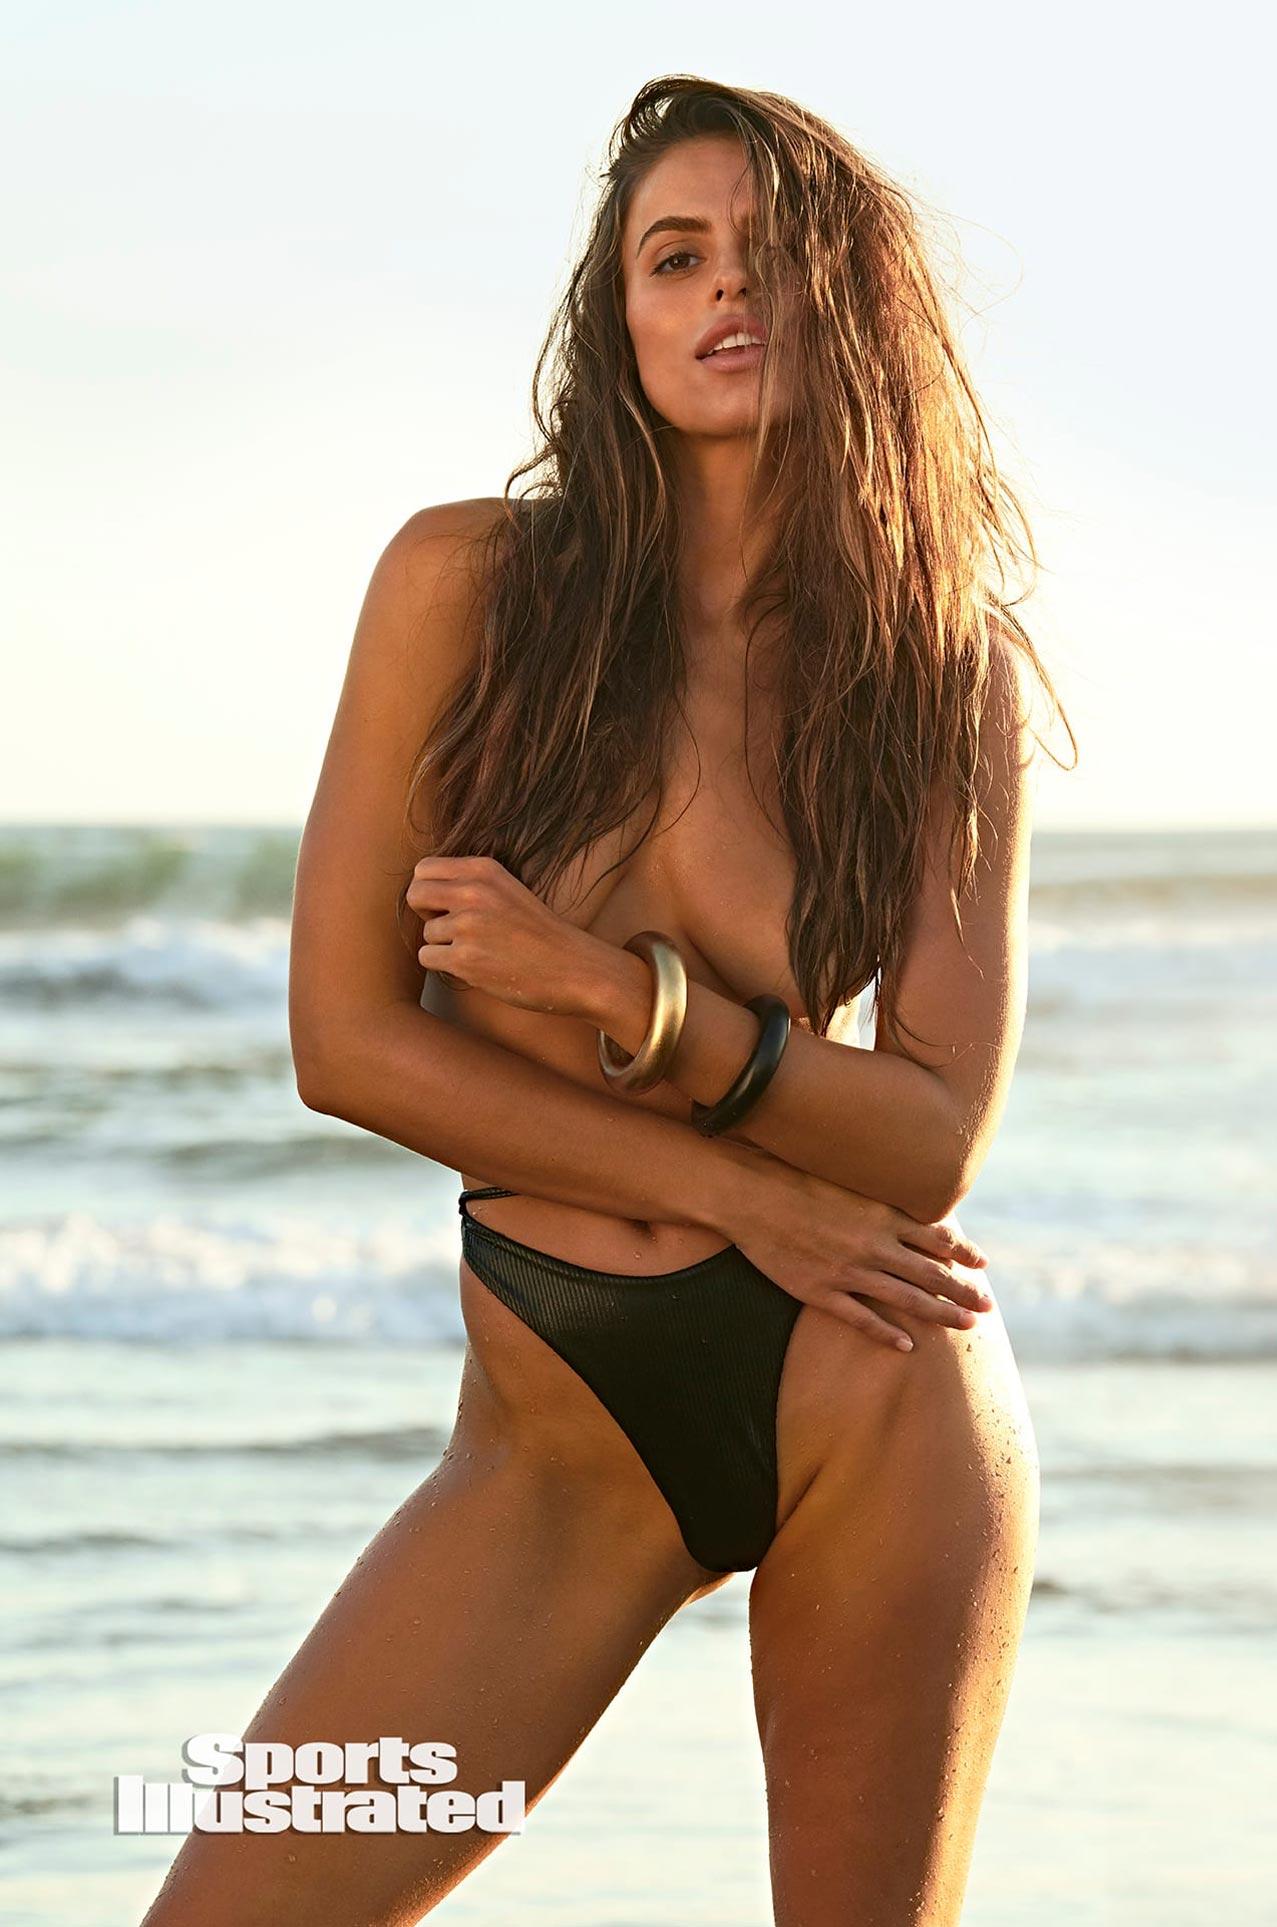 Брукс Надер в каталоге купальников Sports Illustrated Swimsuit 2020 / фото 25